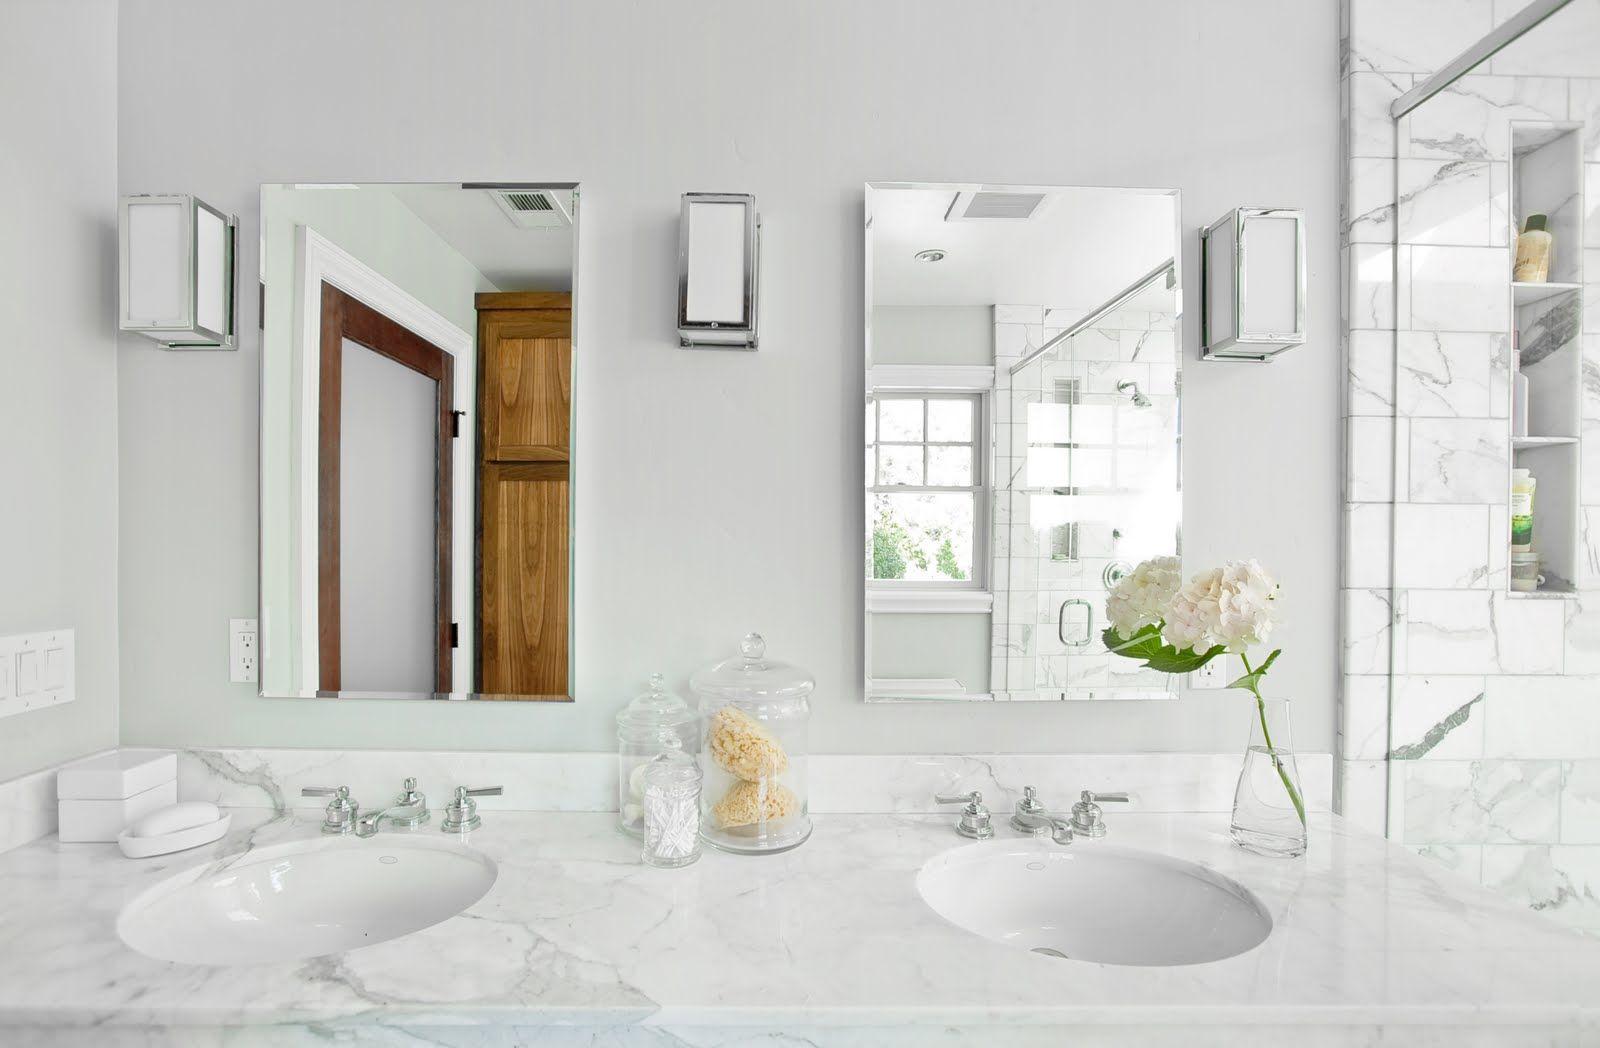 Carrara Marble Tile Bathroom 1000 Images About Bathroom Ideas On Pinterest  Marble Bathrooms White Marble Bathrooms